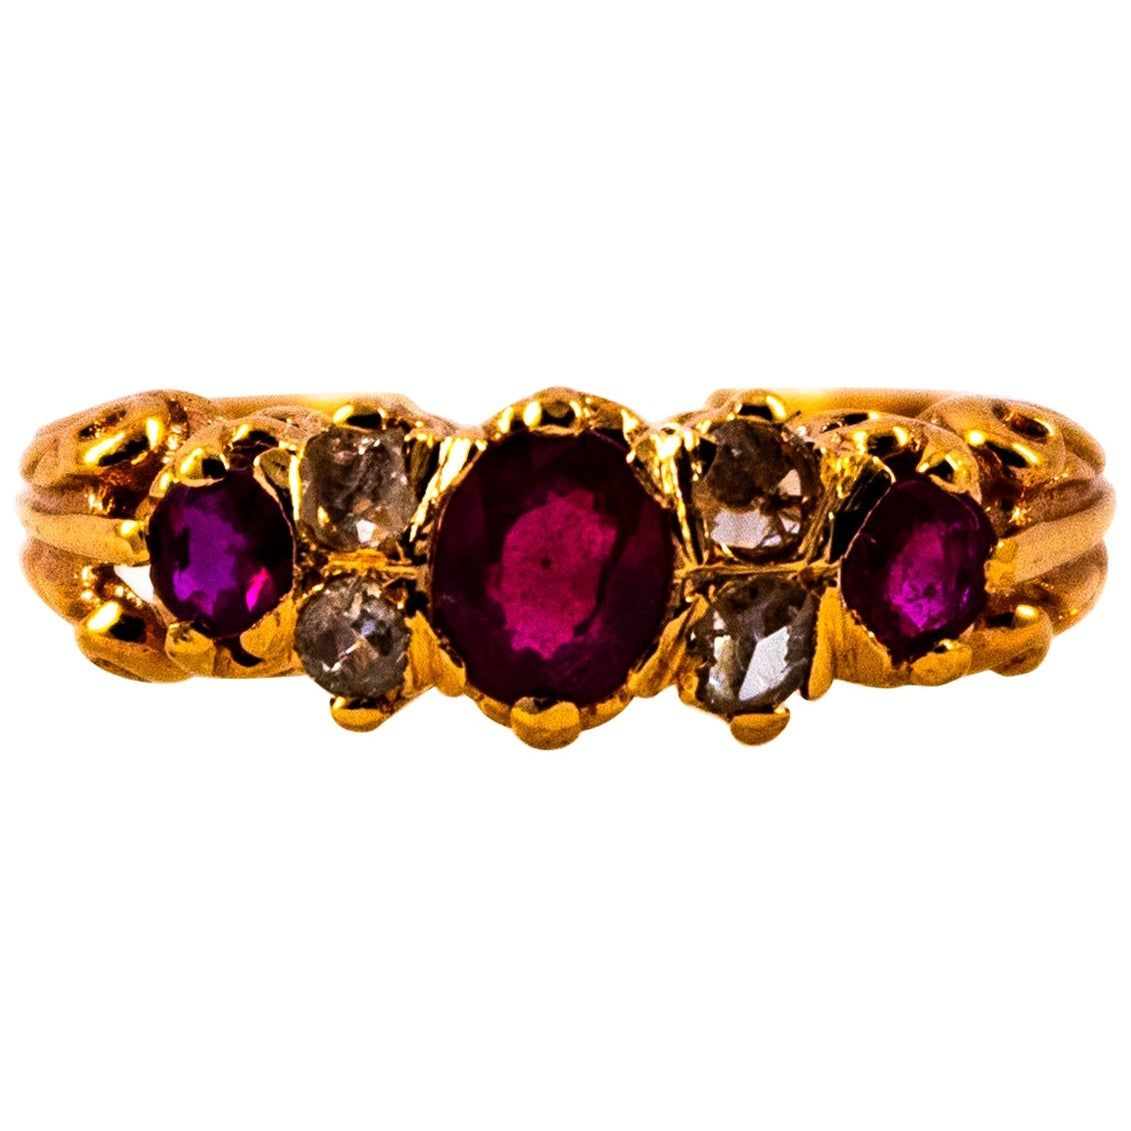 Art Deco 0.75 Carat White Rose Cut Diamond Oval Cut Ruby Yellow Gold Band Ring